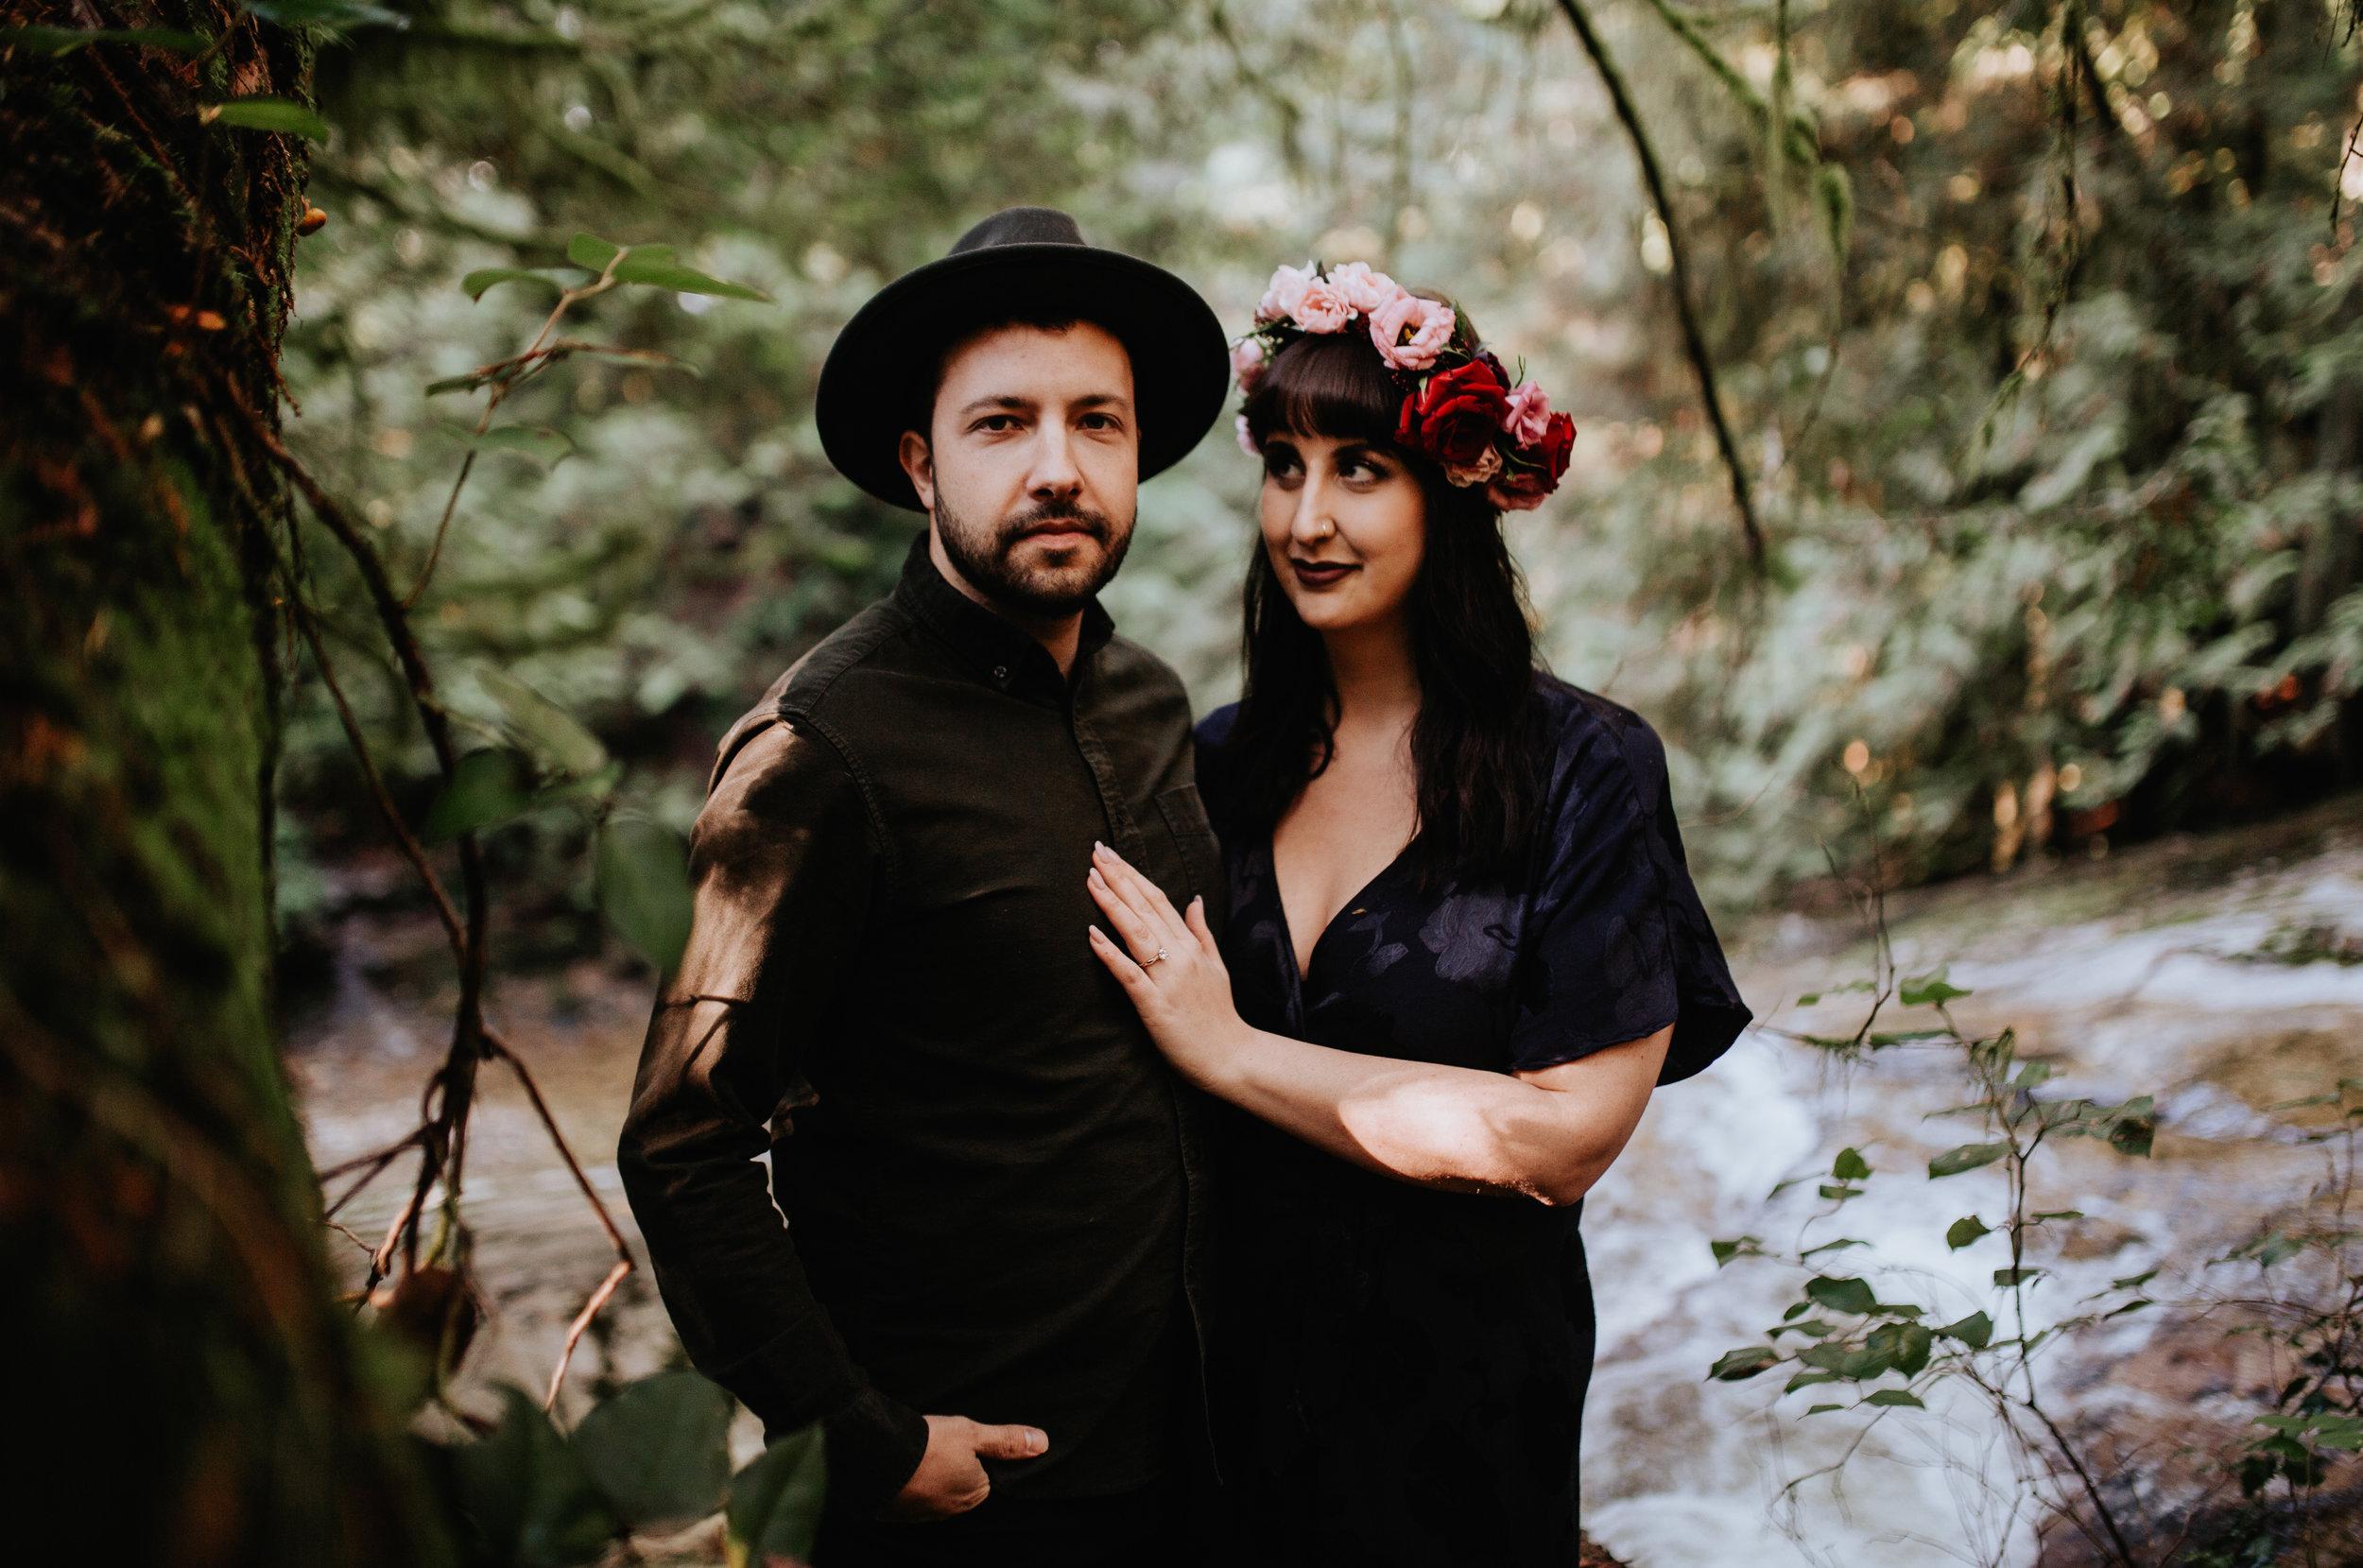 Megan&Michael-PaulineHoldenPhotography-3546.jpg